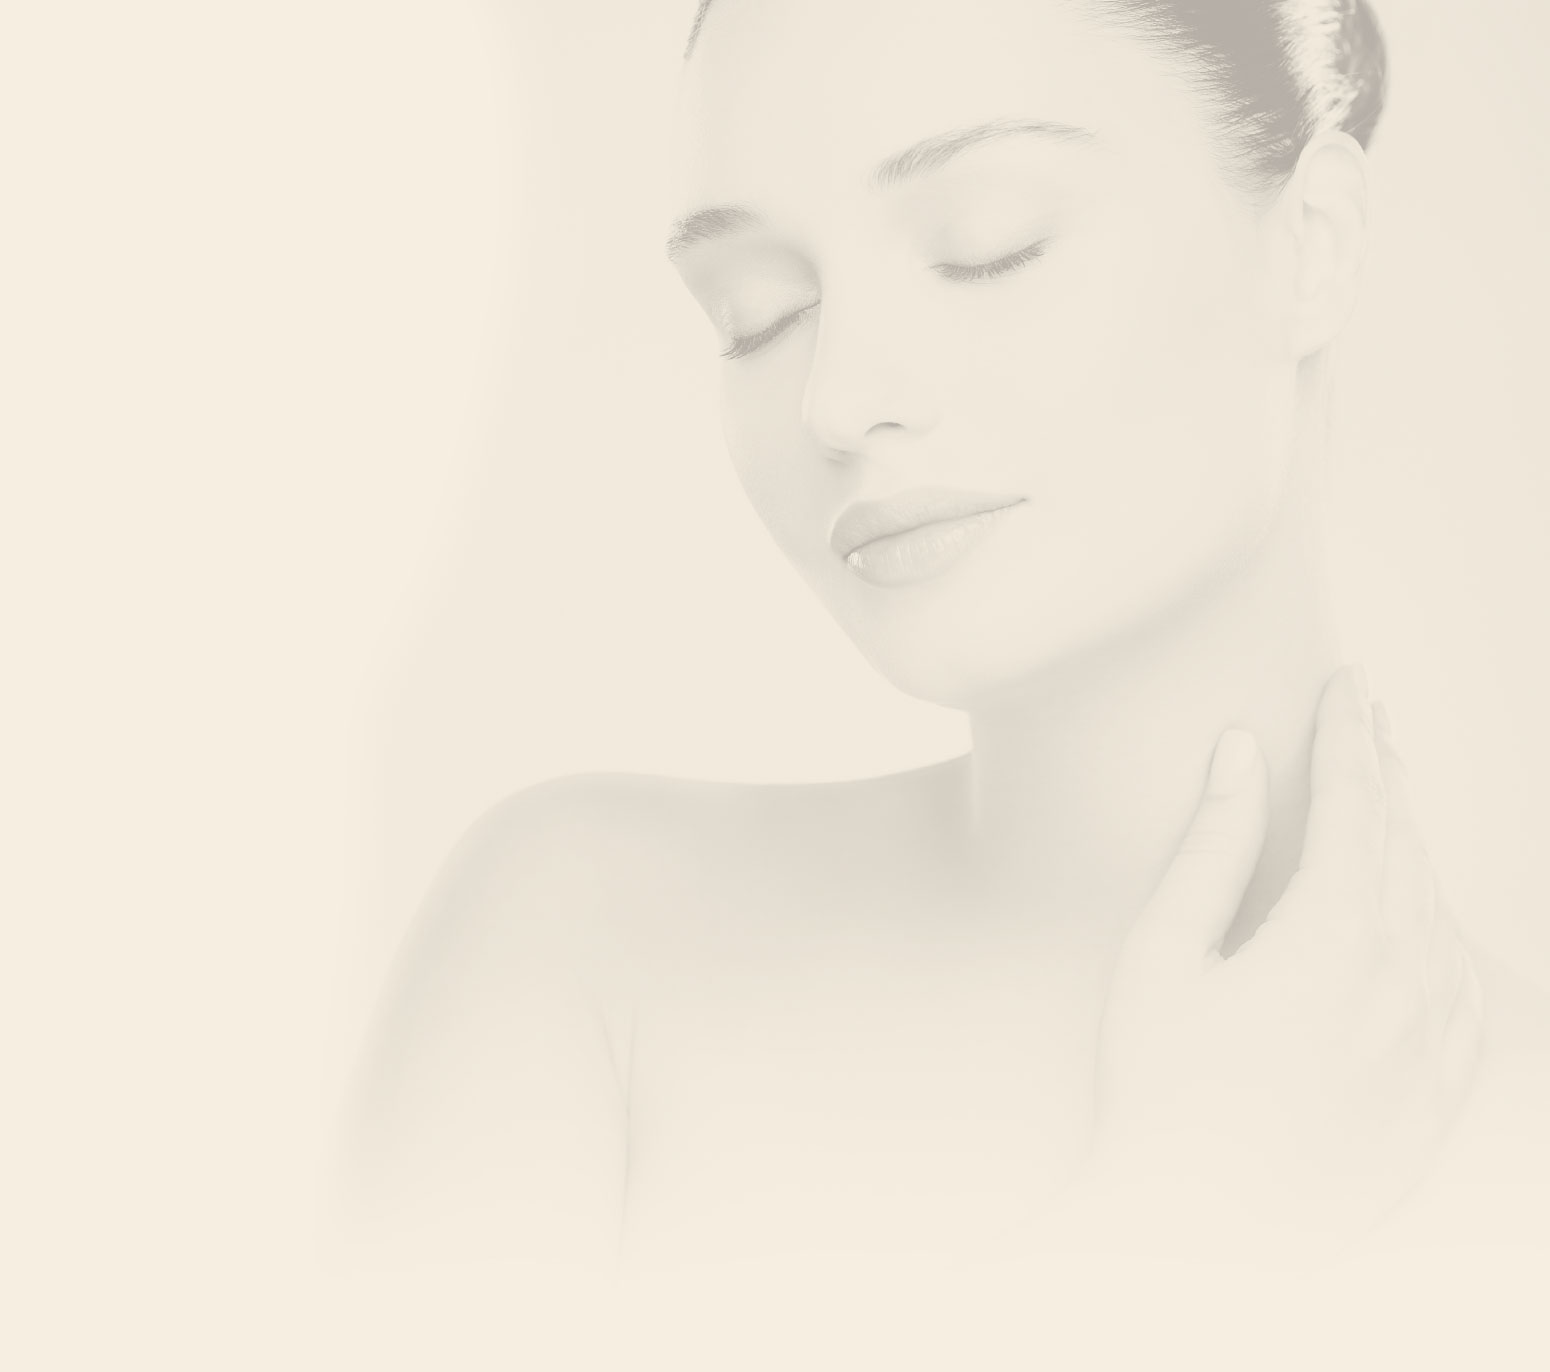 augmentations-mammairescom - Augmentation Mammaire